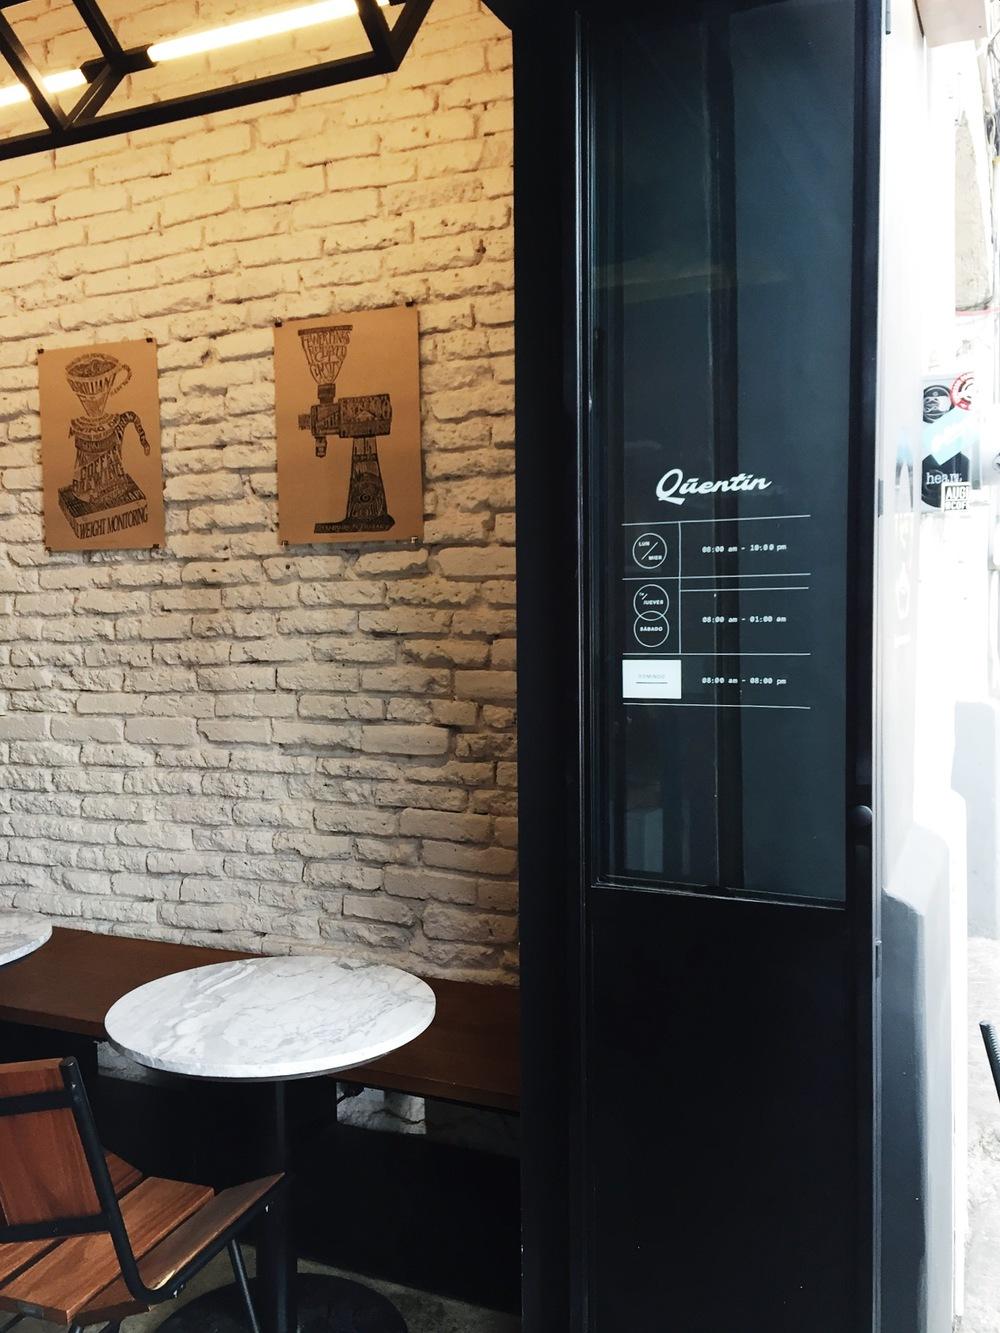 Quentin Café — Colonia Roma